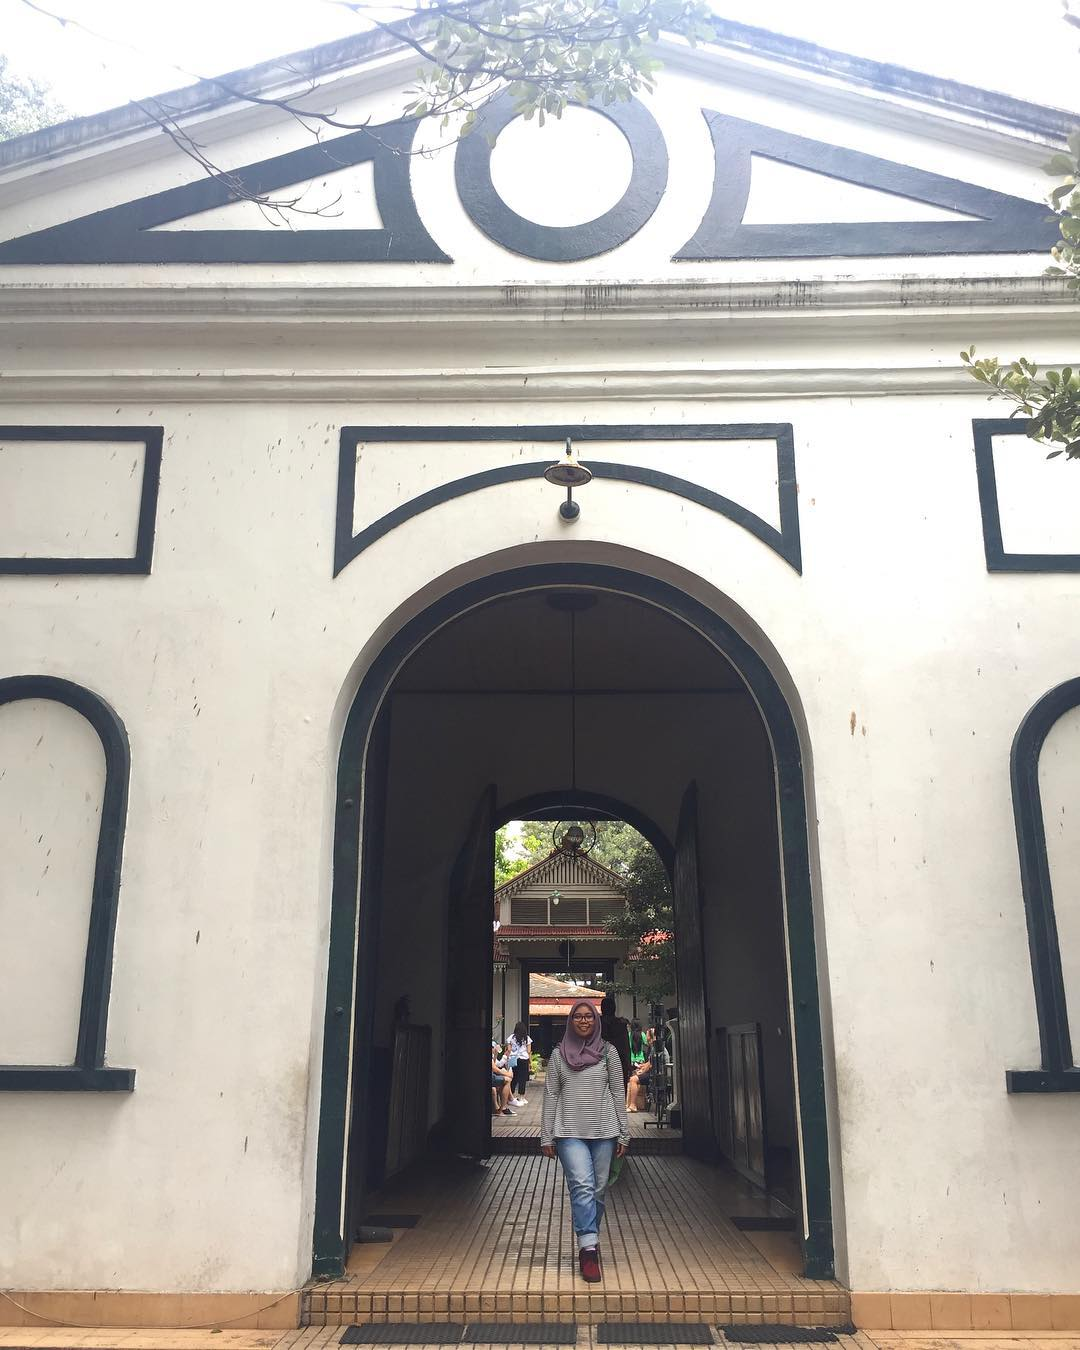 Keraton Ngayogyakarta Hadiningrat, Yogyakarta, Dolan Dolen, Dolaners Keraton Ngayogyakarta Hadiningrat via sisilsiel - Dolan Dolen